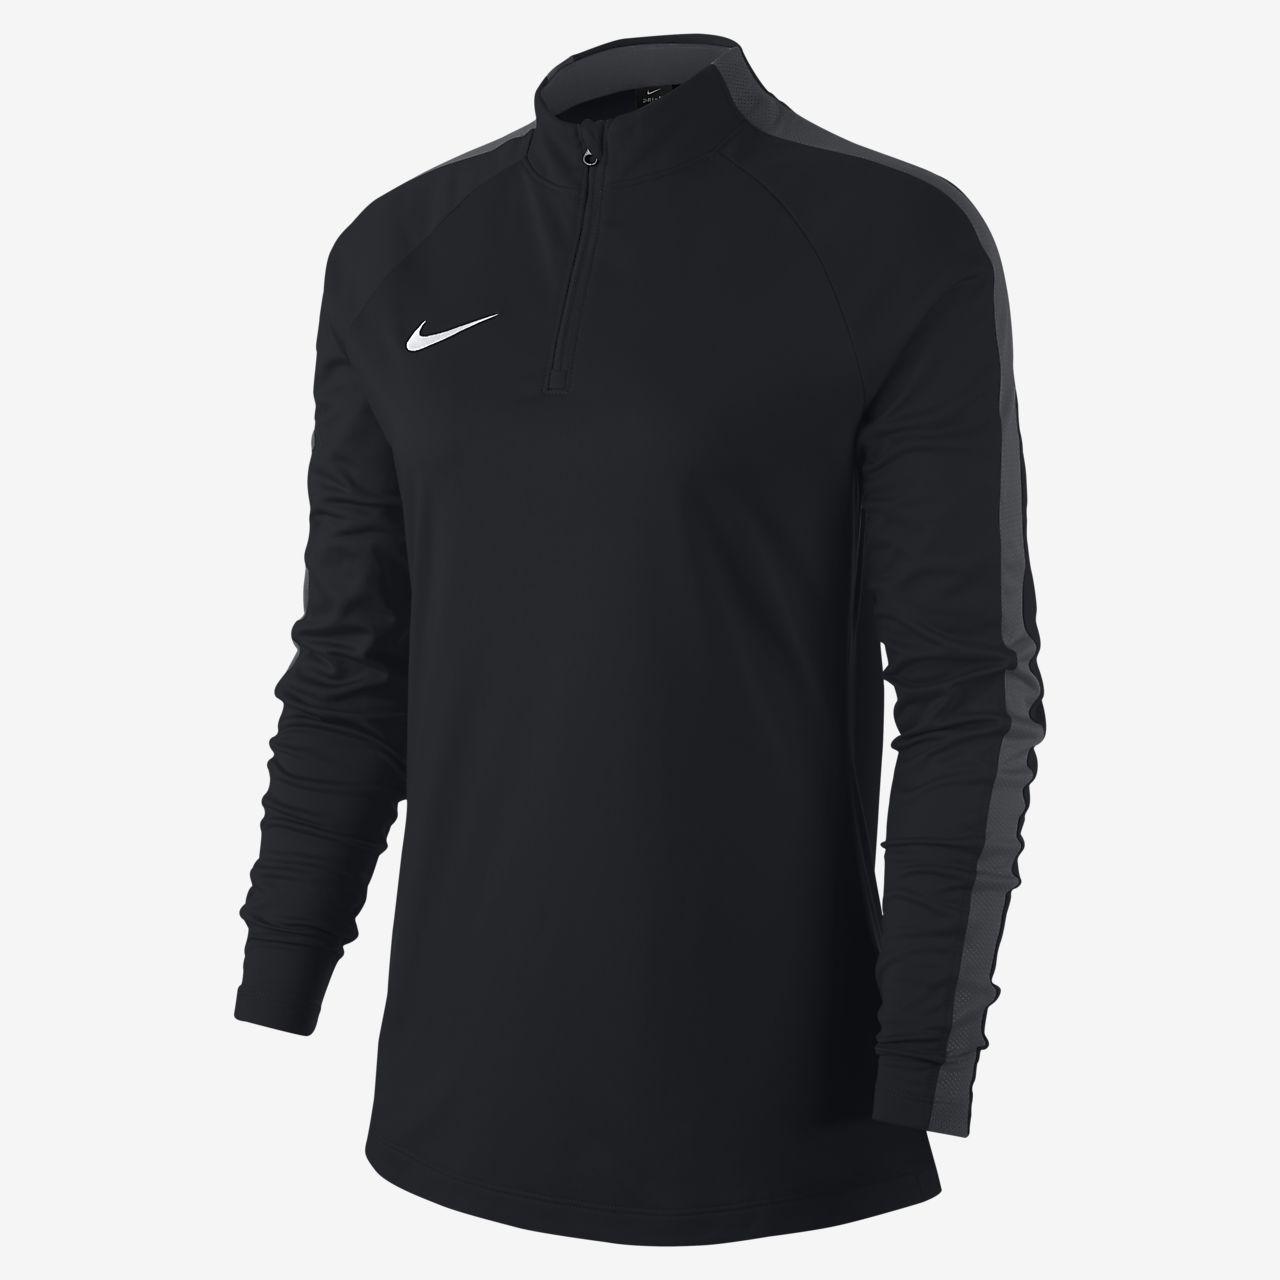 Camisola de futebol de manga comprida Nike Dri-FIT Academy Drill para mulher